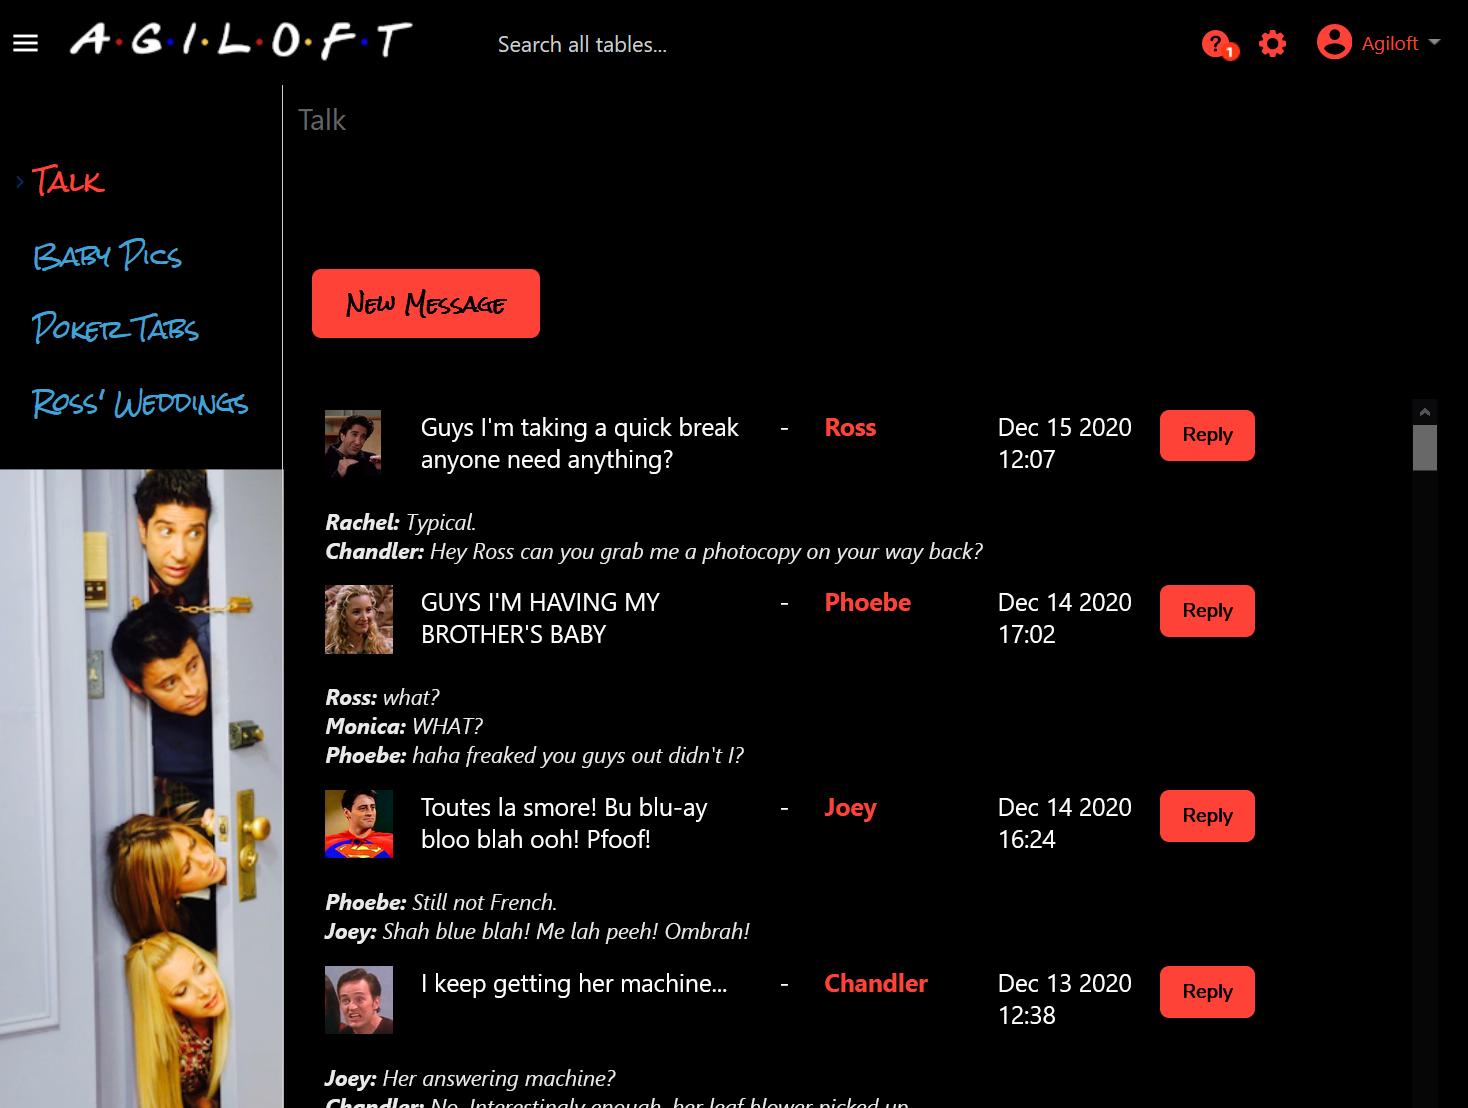 Agiloft Friends themed look and feel scheme